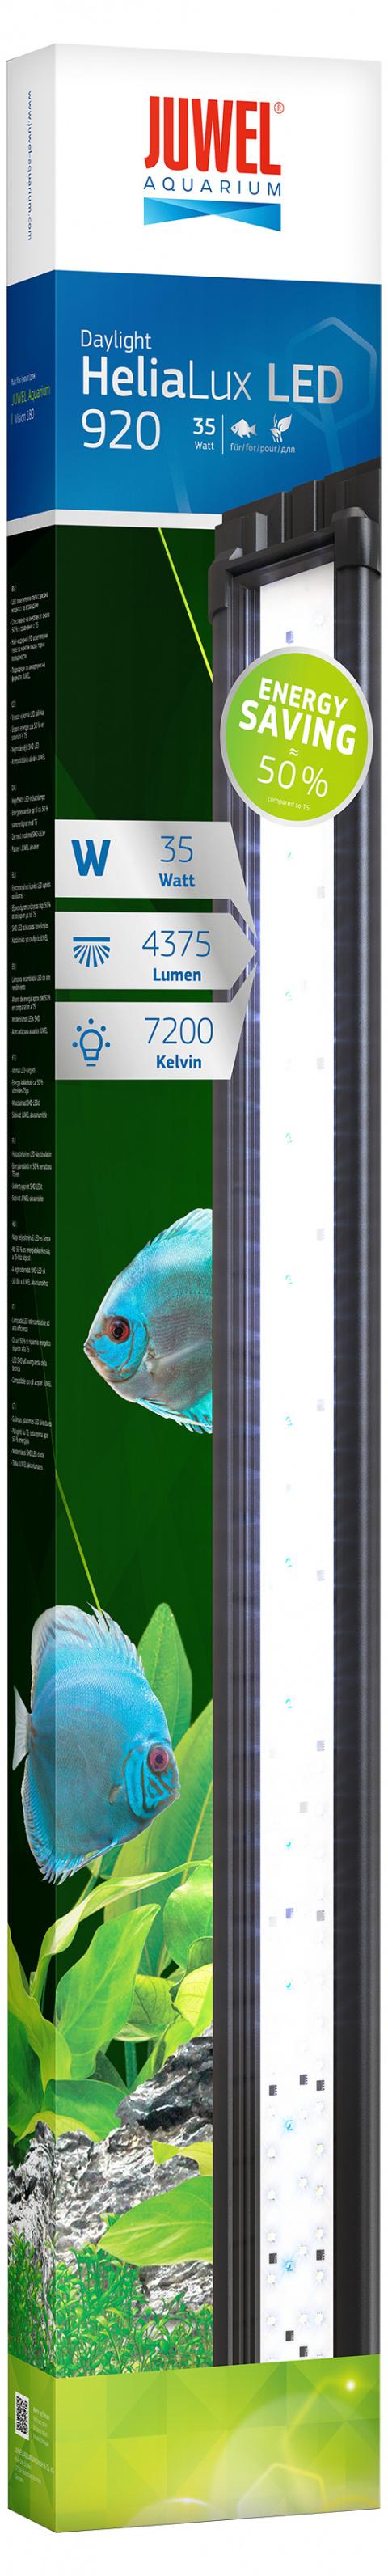 Dienas gaisma akvārijam - Juwel Helia Lux LED 920, 35 W  title=